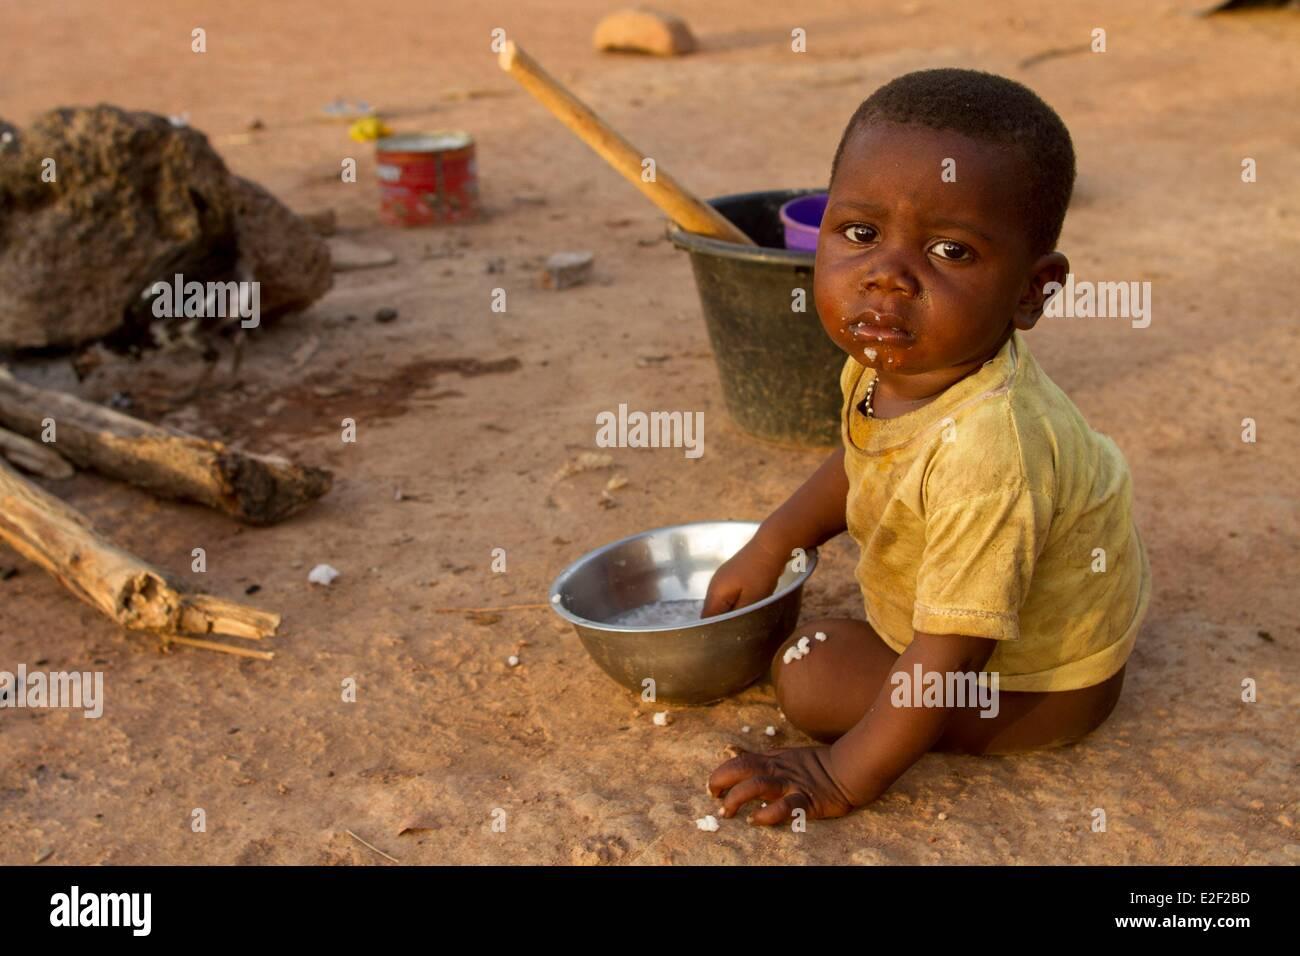 Burkina Faso, village in Senoufo area - Stock Image